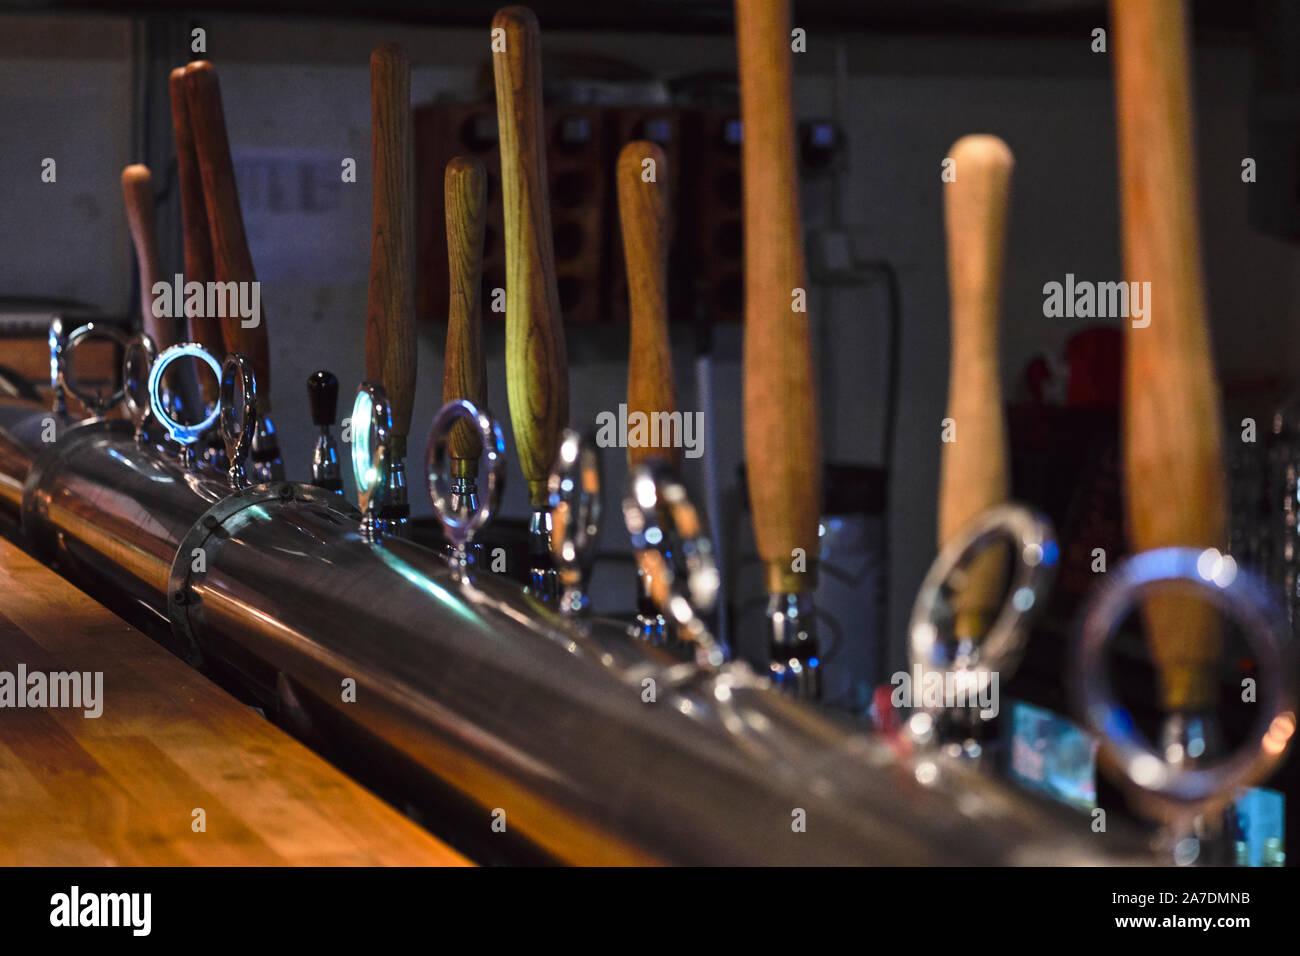 Ægisgarður, craft beer factory in Reykjavik, Icleand Stock Photo